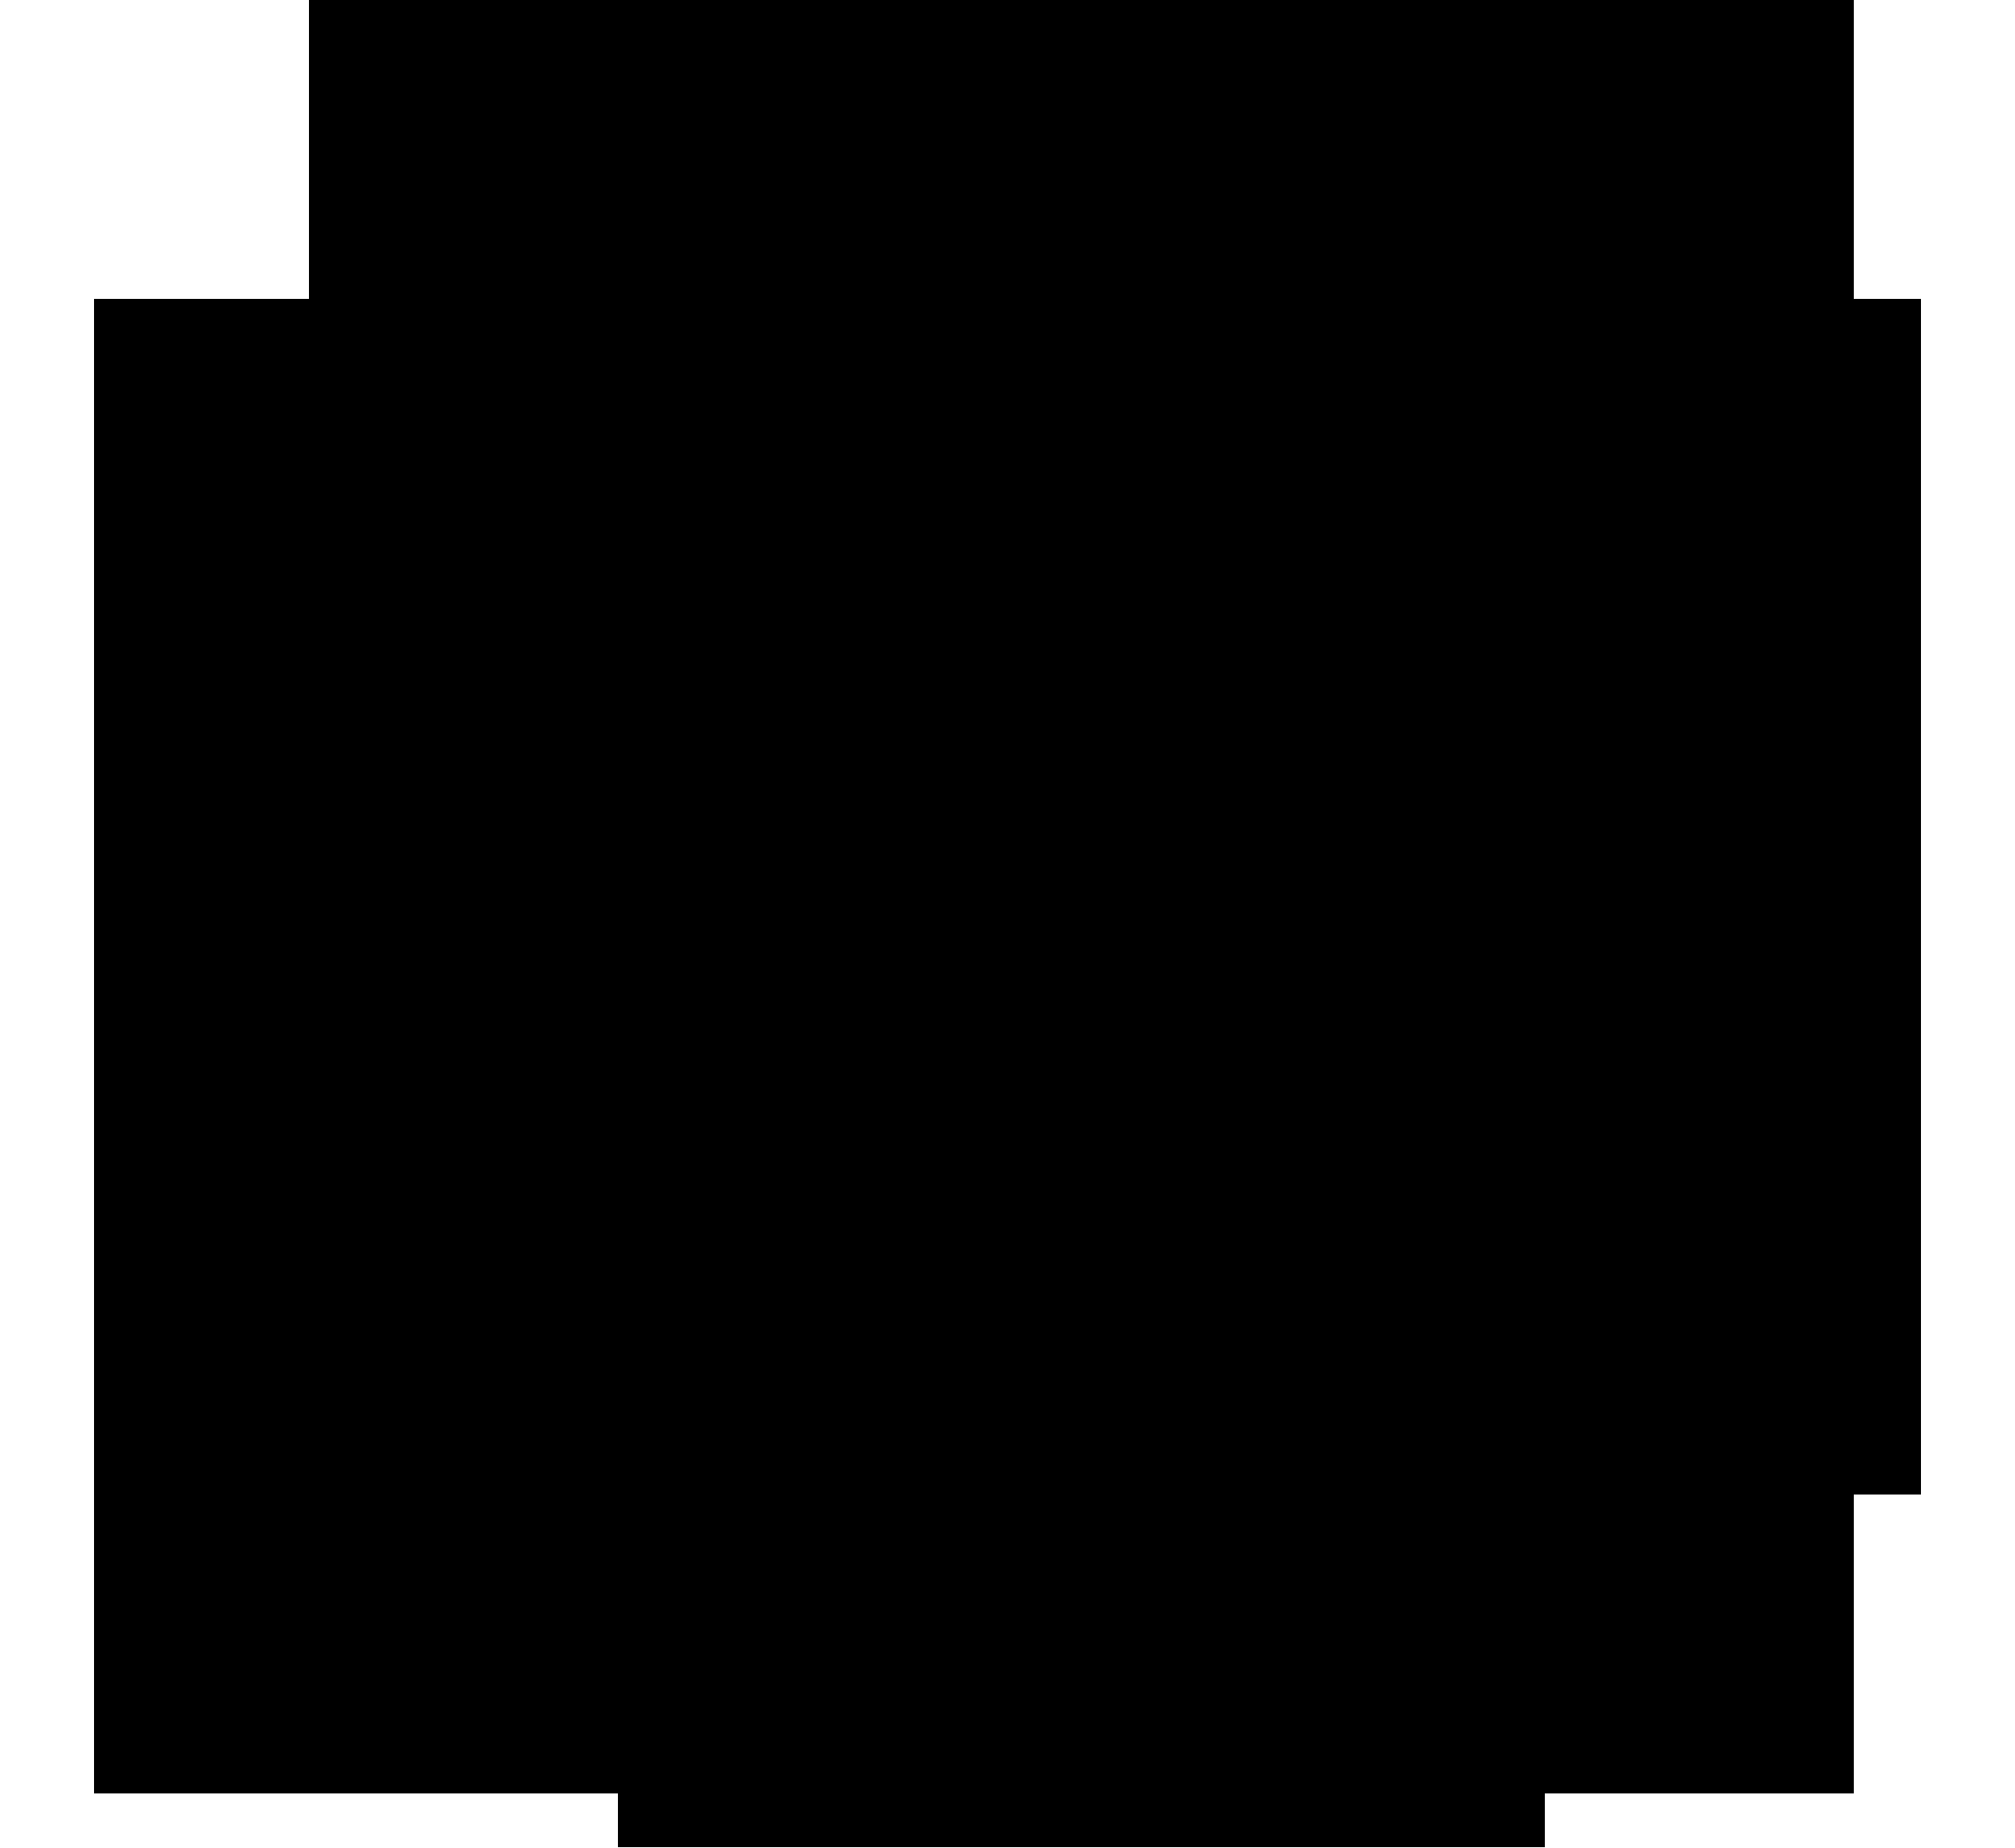 Toronto Raptors Logo Png Transparent Svg Vector Freebie Supply Toronto Raptors Raptors Basketball Raptors